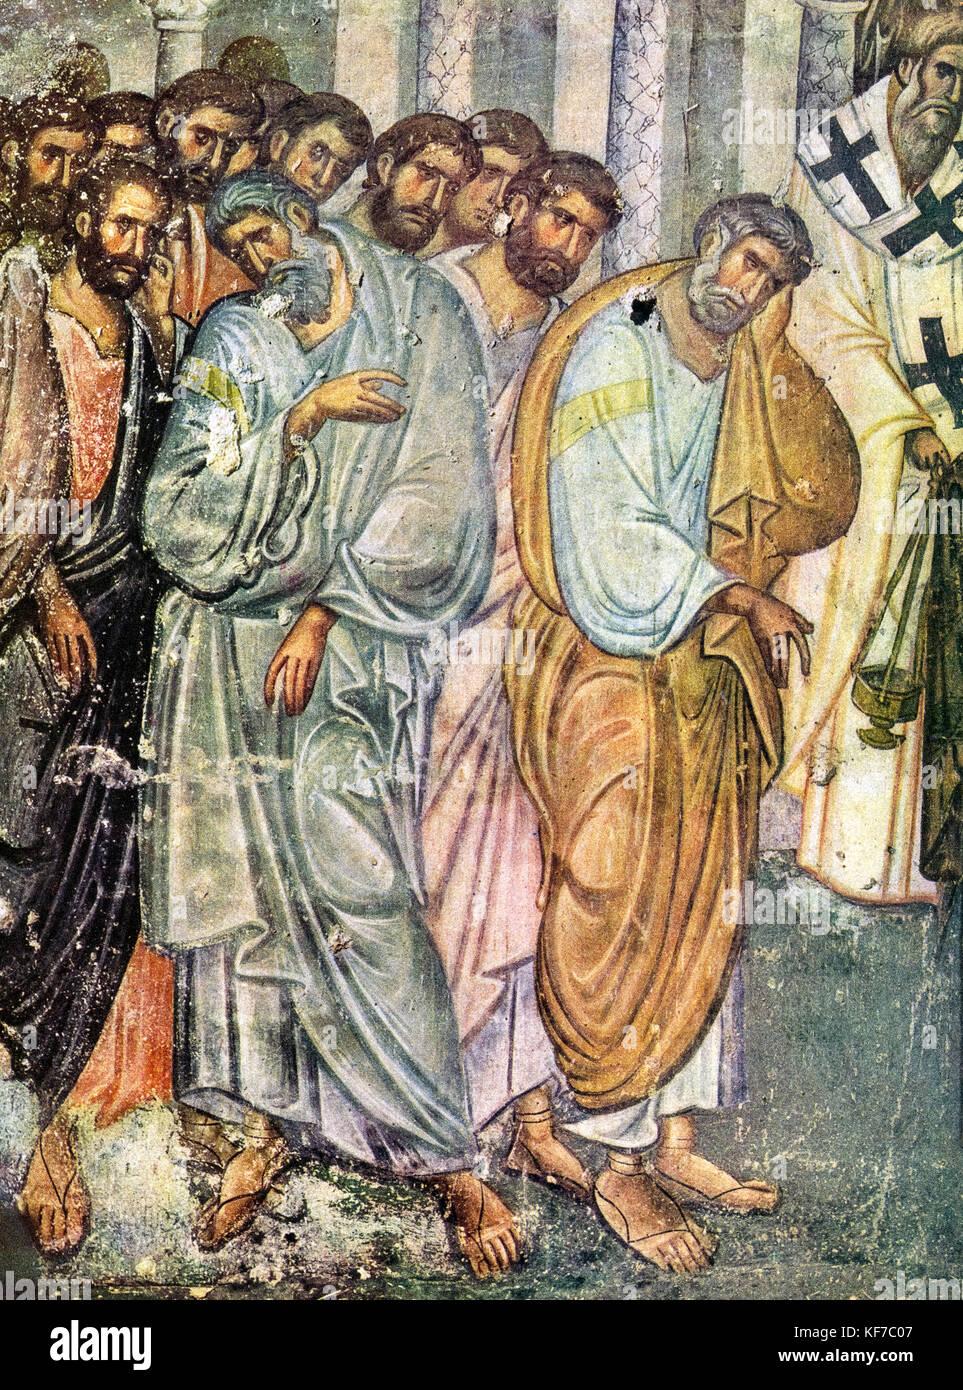 Serbia - Sopocani Monasteri -Dormition of the virgin - fresco 1265 . detail apostles - Stock Image